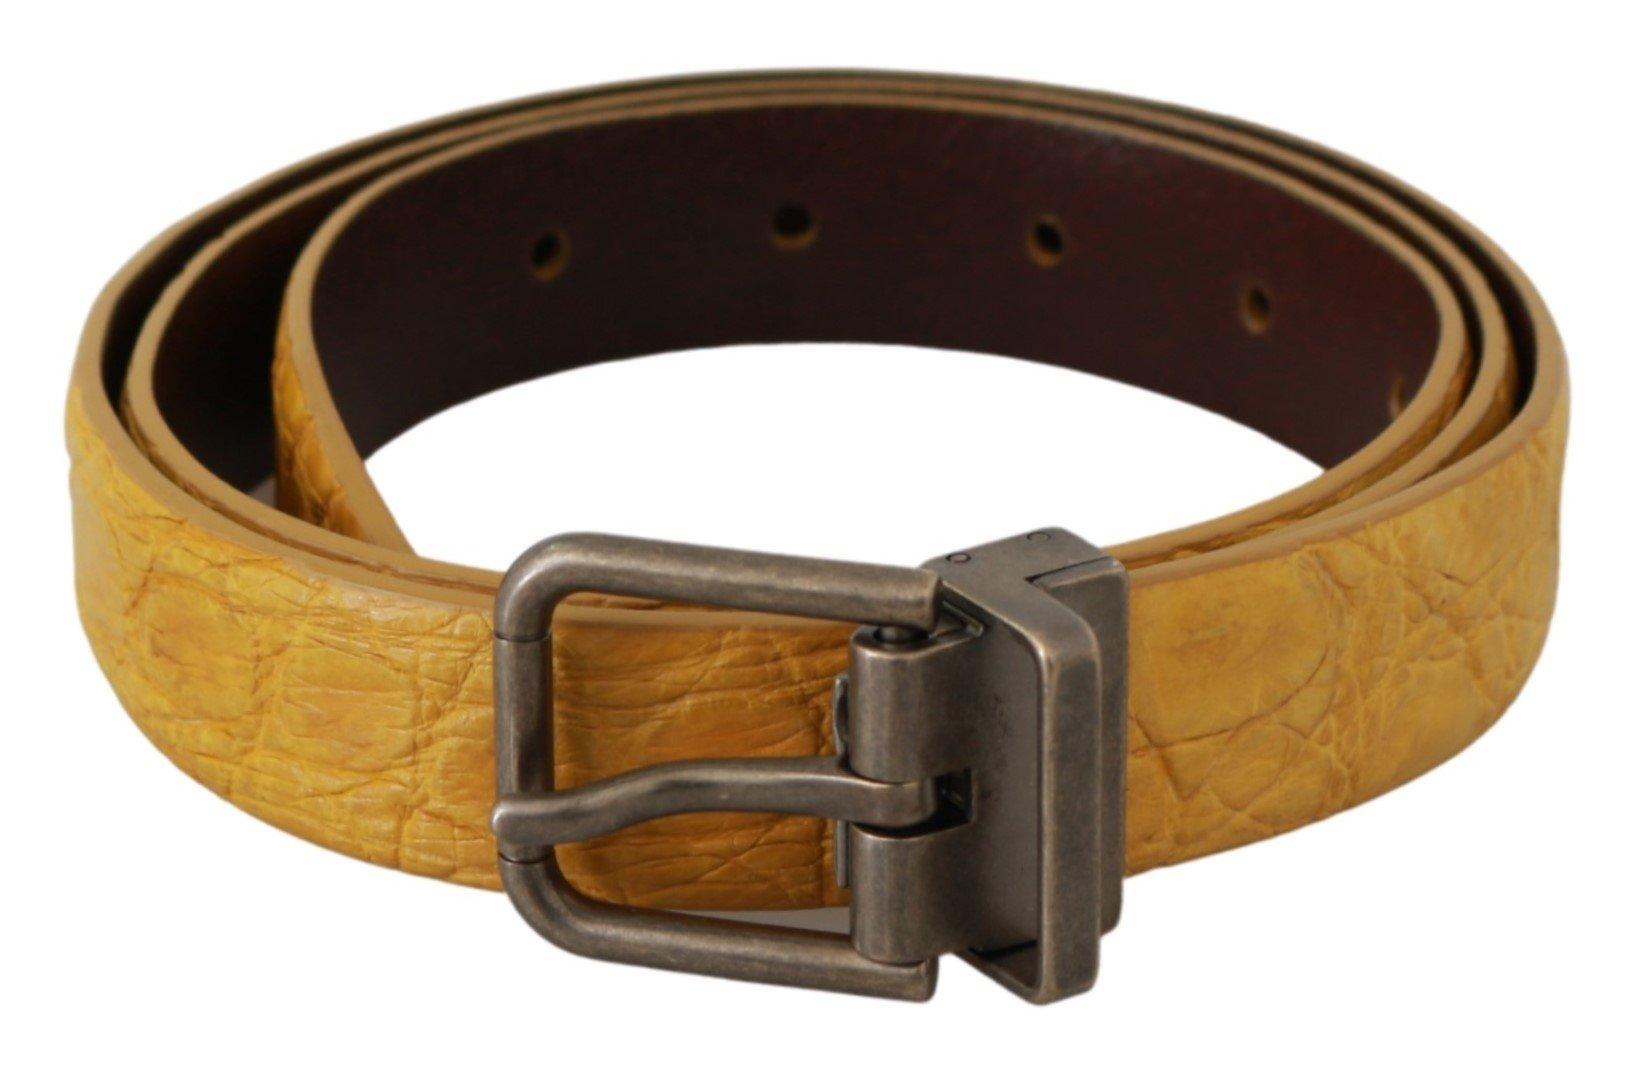 Dolce & Gabbana Men's Exotic Skin Leather Buckle Belt Gray BEL60628 - 100 cm / 40 Inches